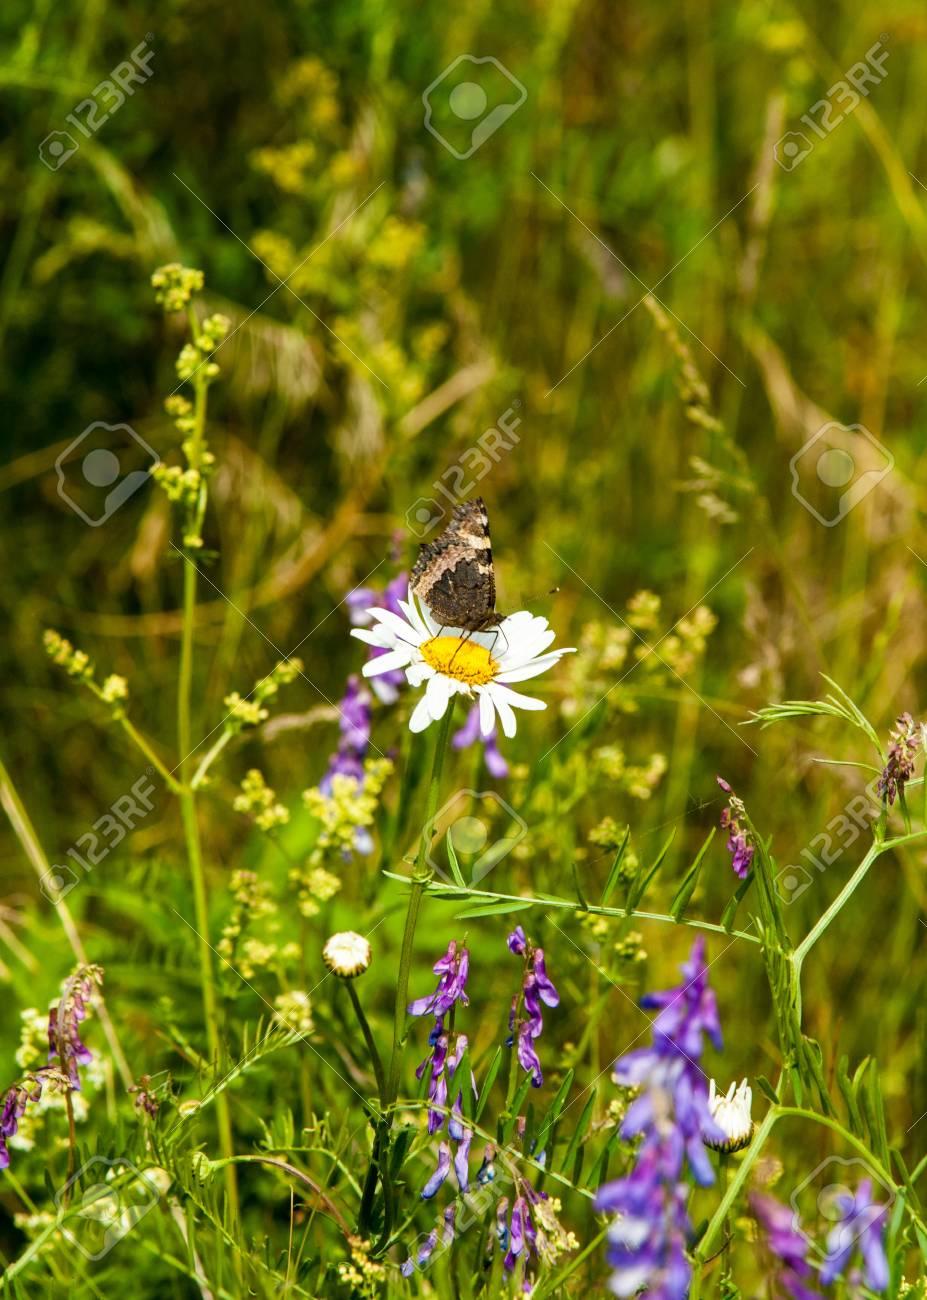 Feld Erbse Blumen Maus. Süße Erbsen Blüht. Süße Erbse Lizenzfreie ...